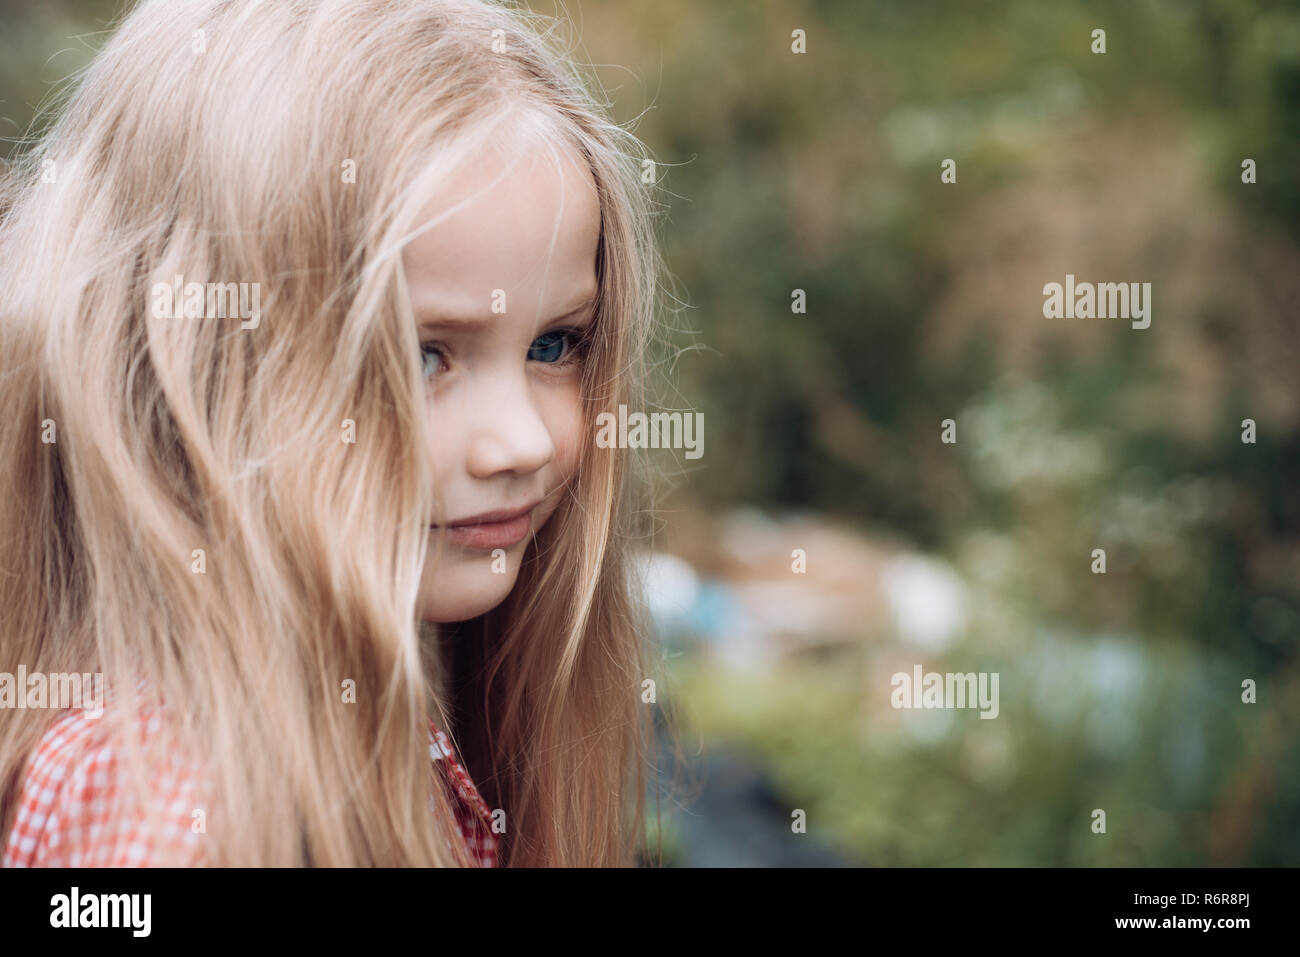 Unbinding My Hair Little Girl Wear Long Hair Little Girl With Blond Hair Happy Little Child